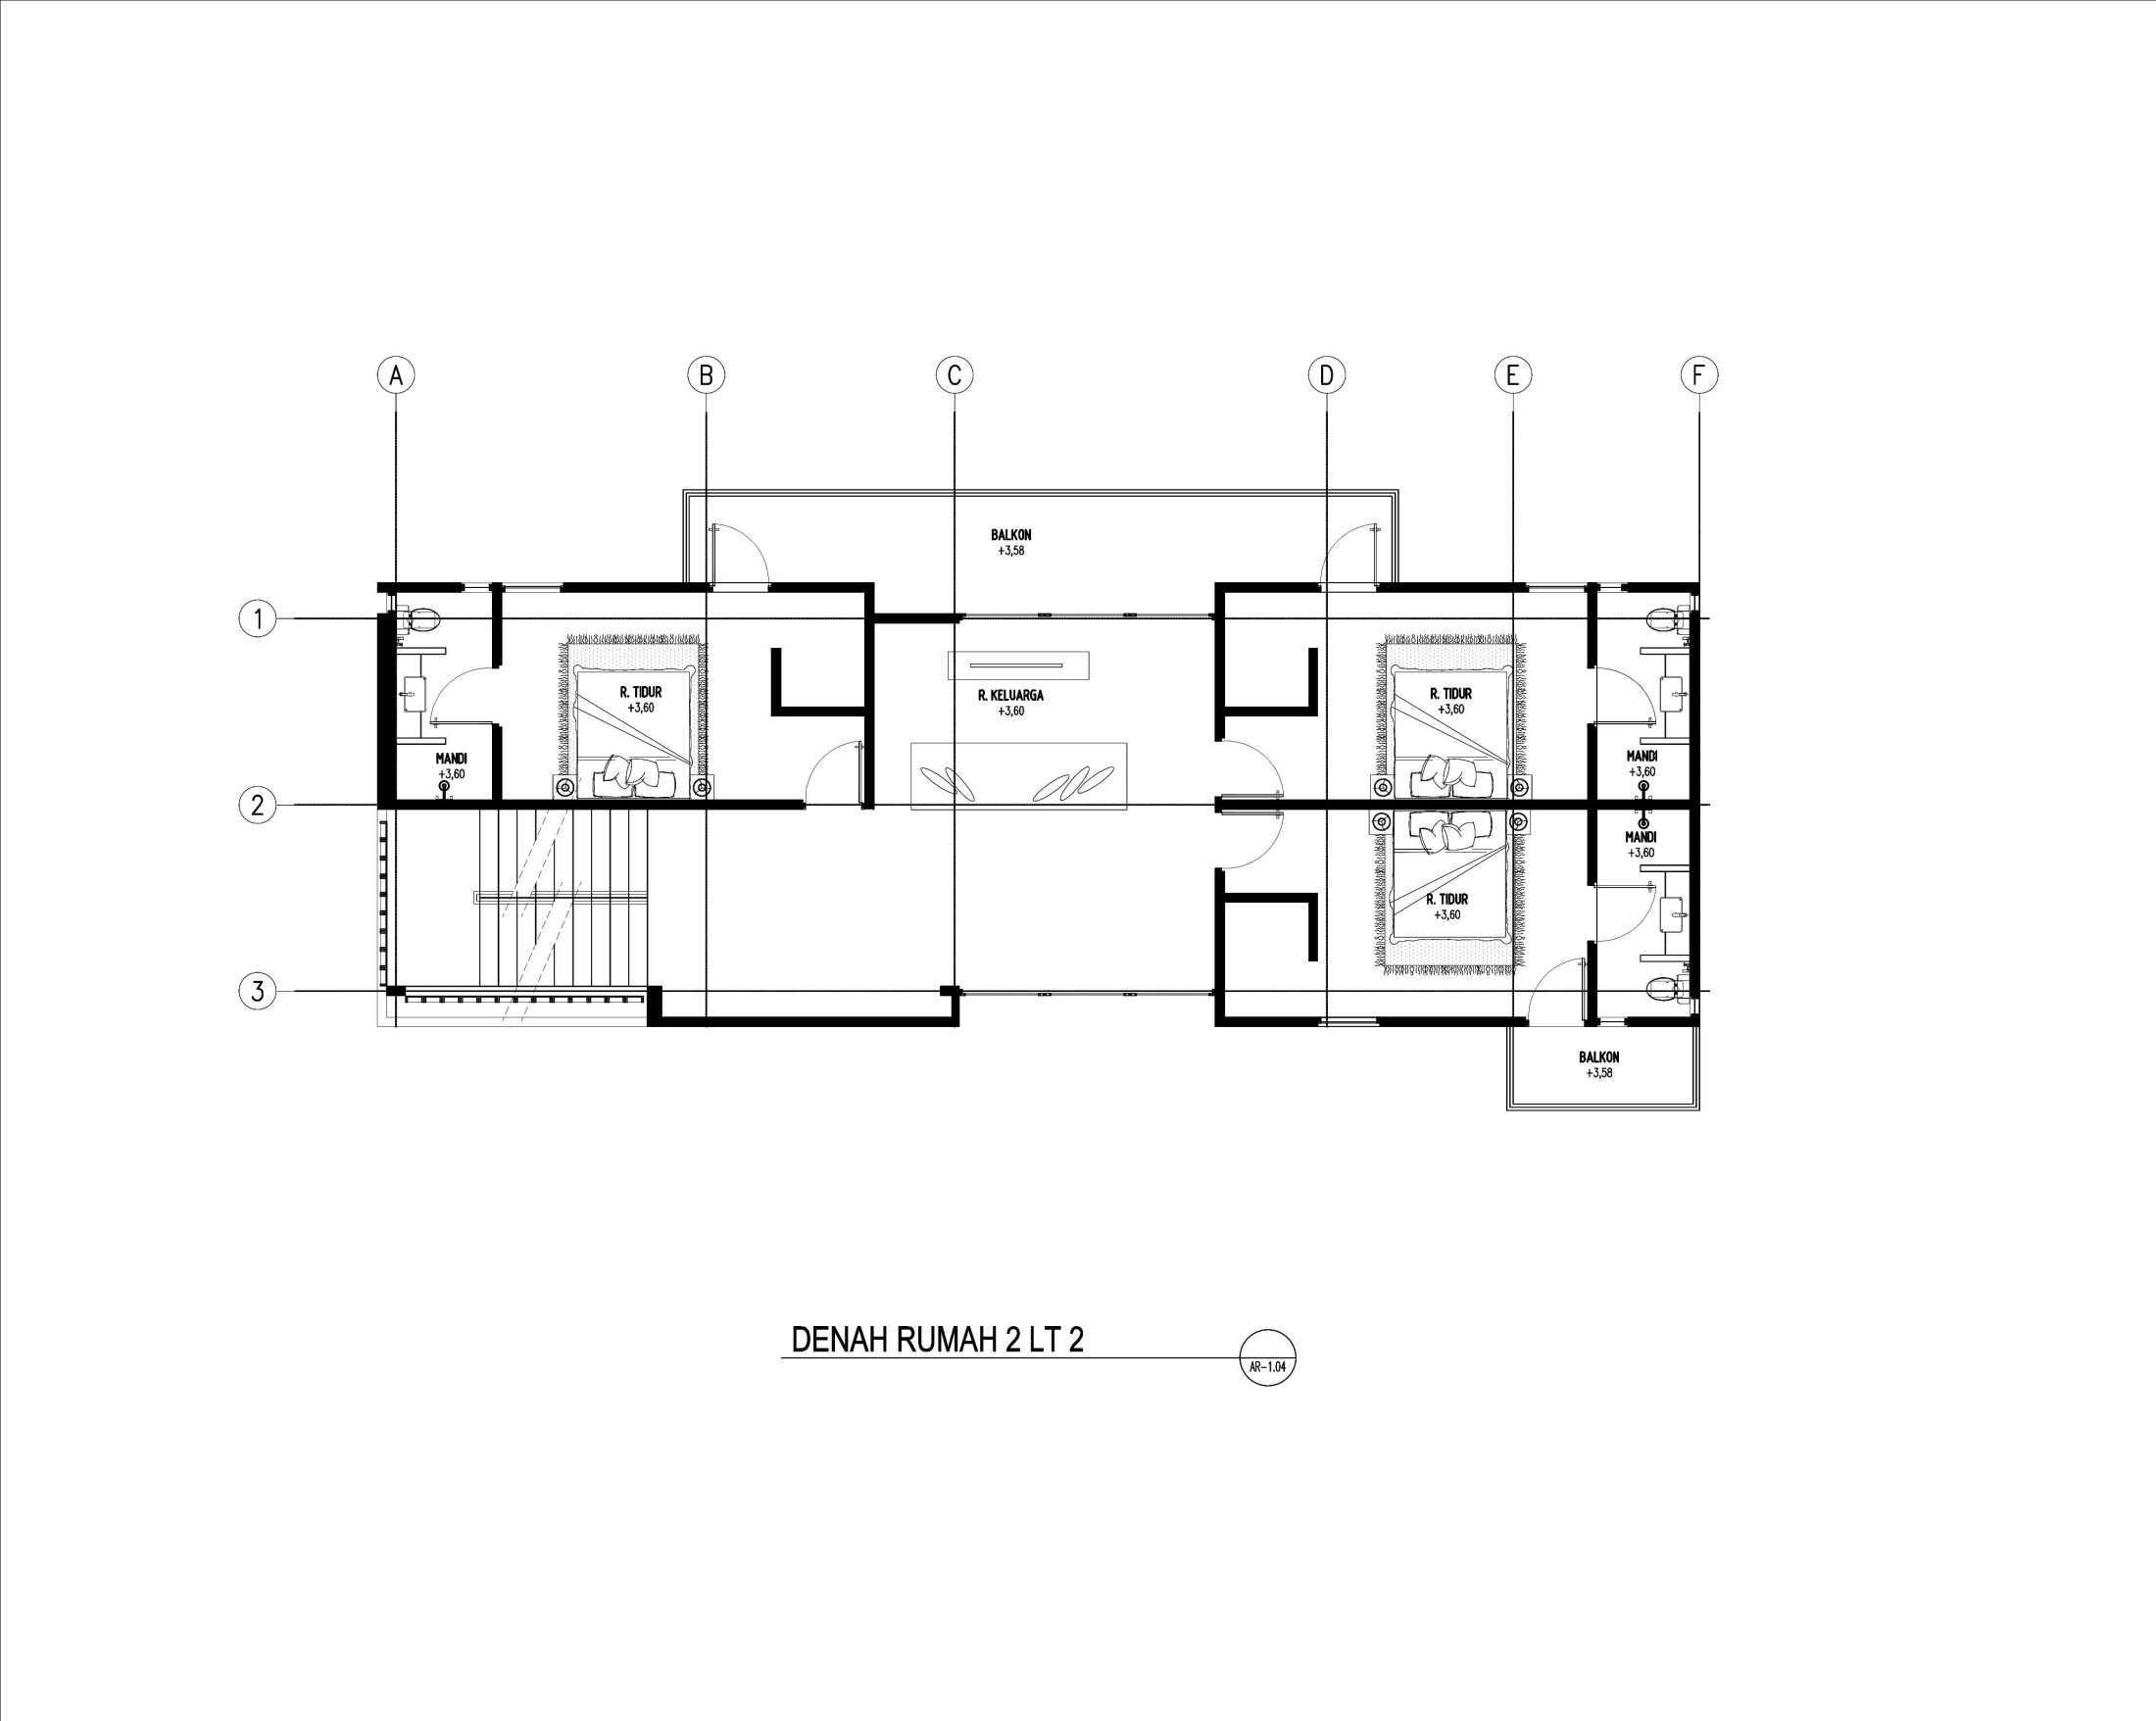 Gubah Ruang Ms House Kabupaten Garut, Jawa Barat, Indonesia Kabupaten Garut, Jawa Barat, Indonesia Gubah-Ruang-Studio-Ms-House  59339